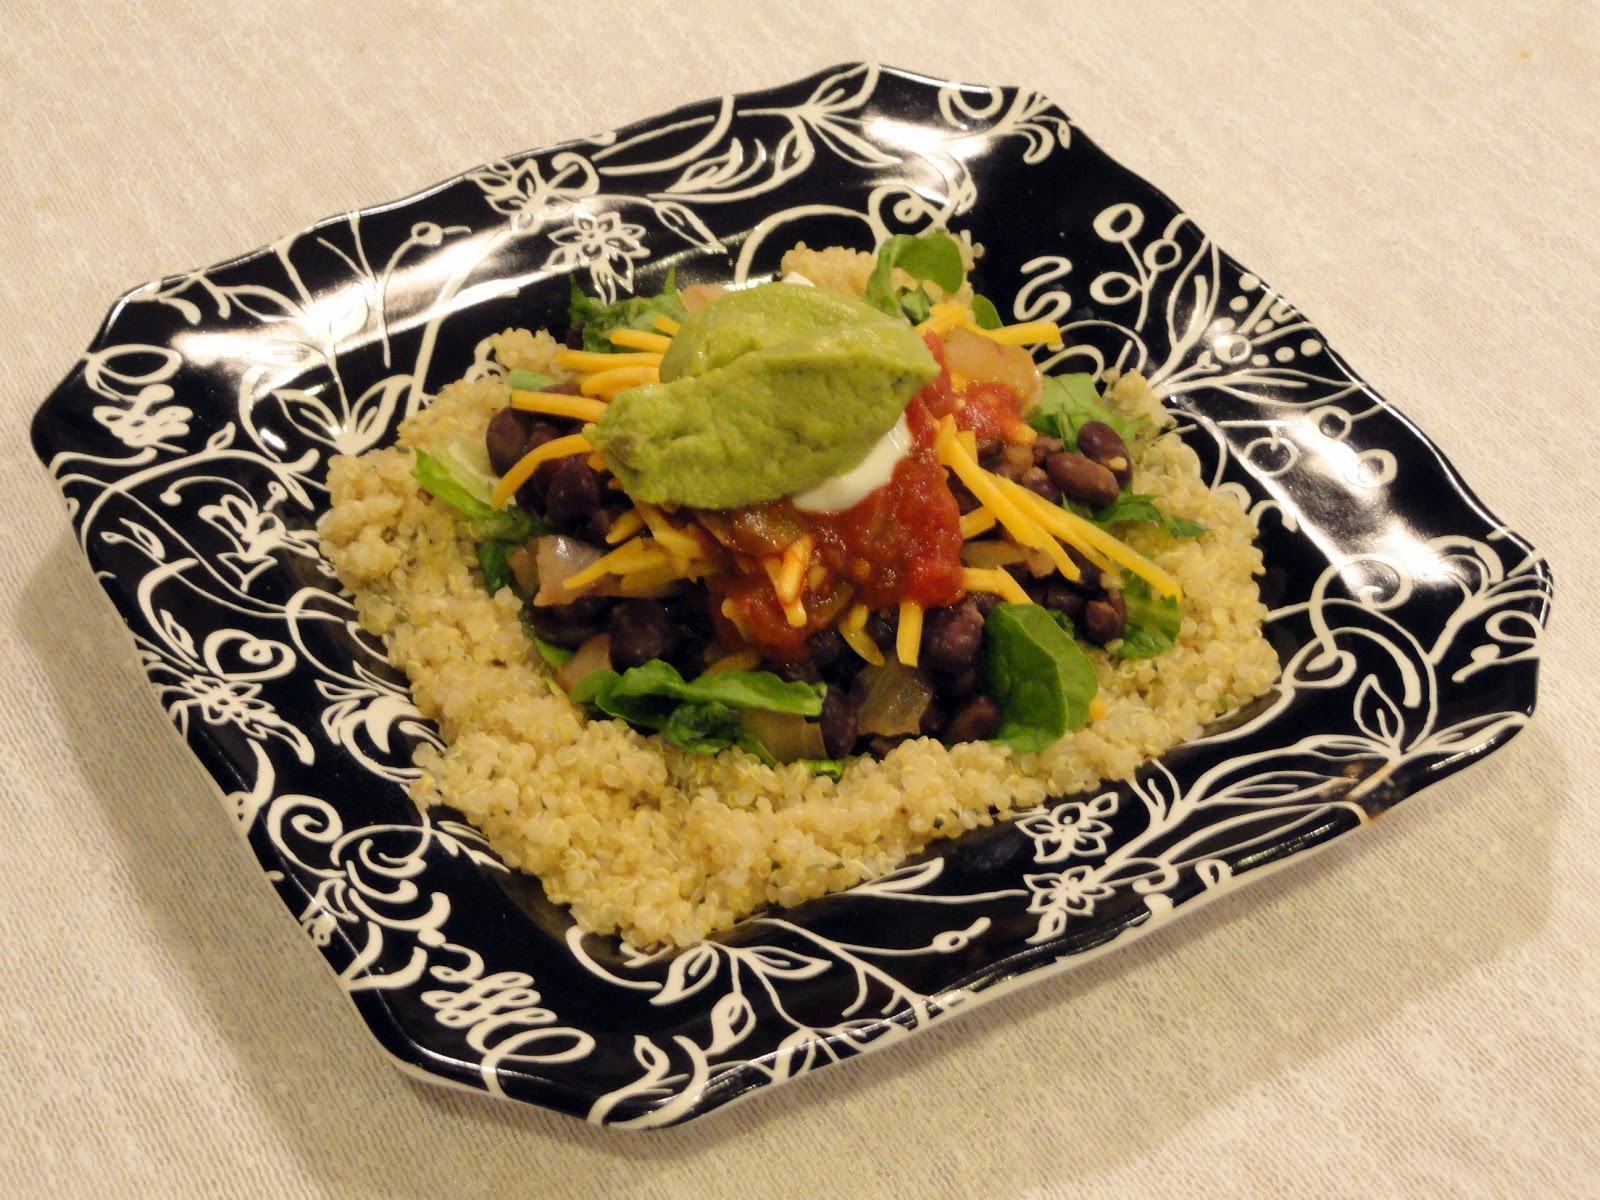 As Good As Gluten: Quinoa Black Bean Burrito Bowl